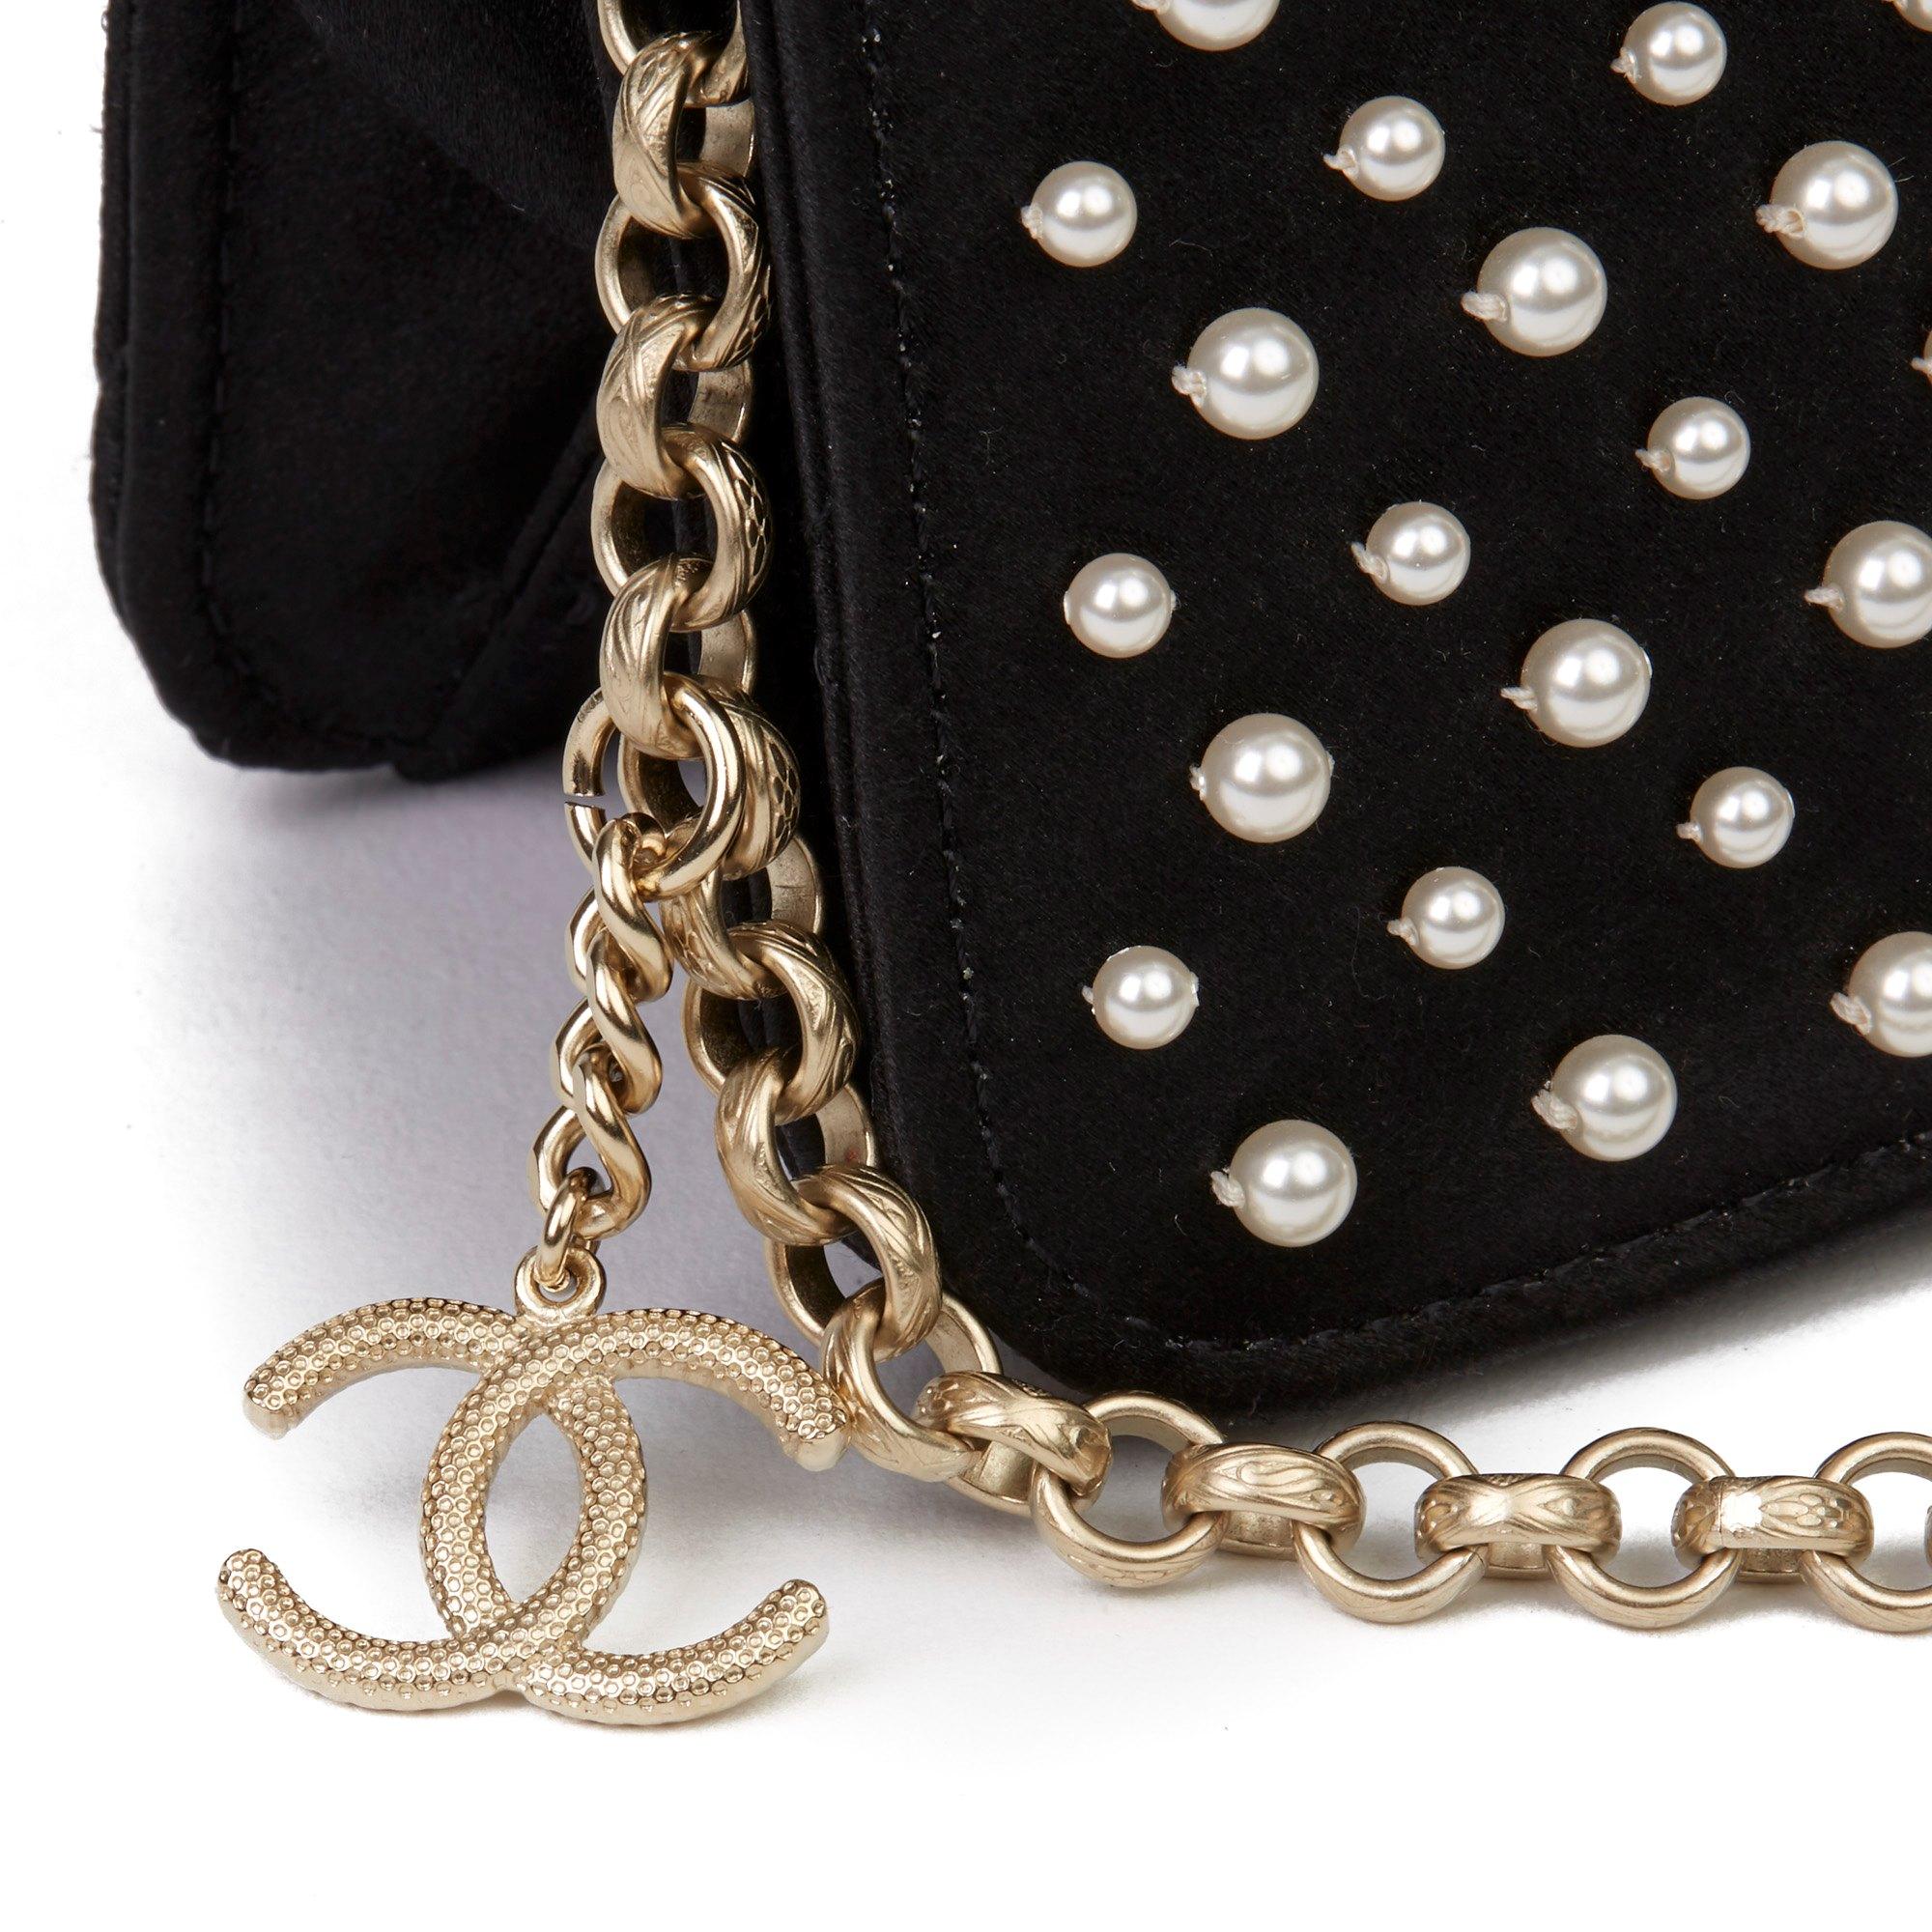 Chanel Black Embellished Quilted Satin Pearl Flap Bag